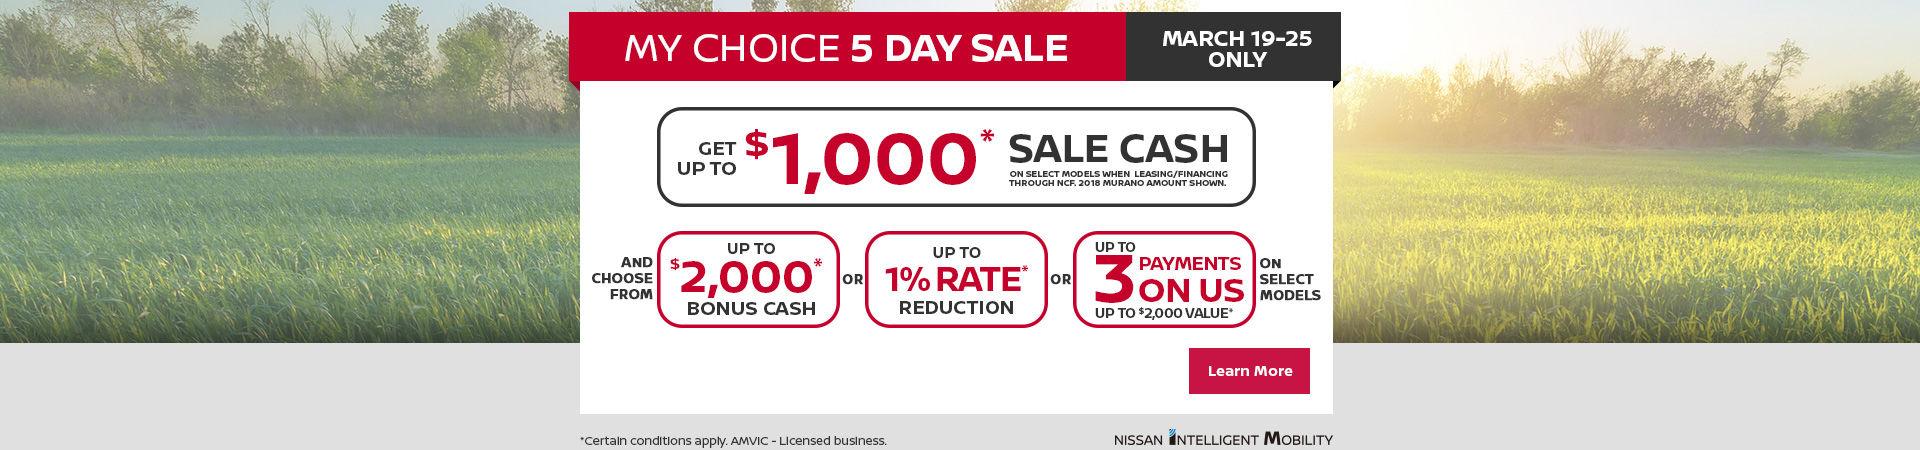 My Choice 5 day sale